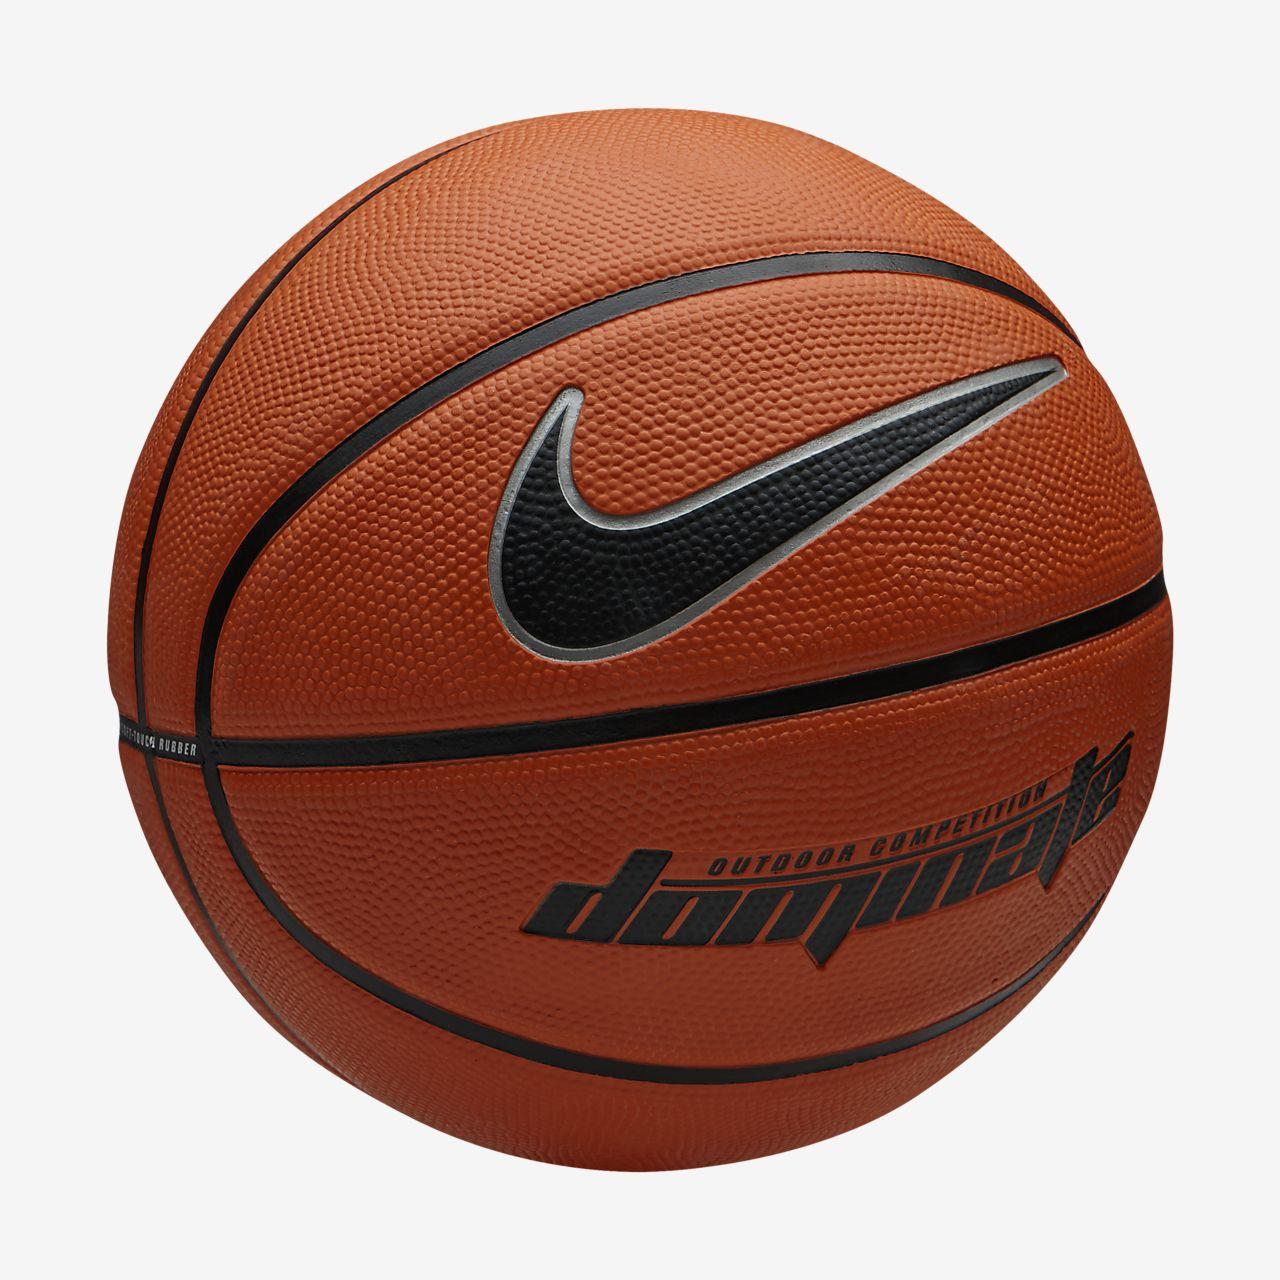 Bola de basquetebol Nike Dominate 8P